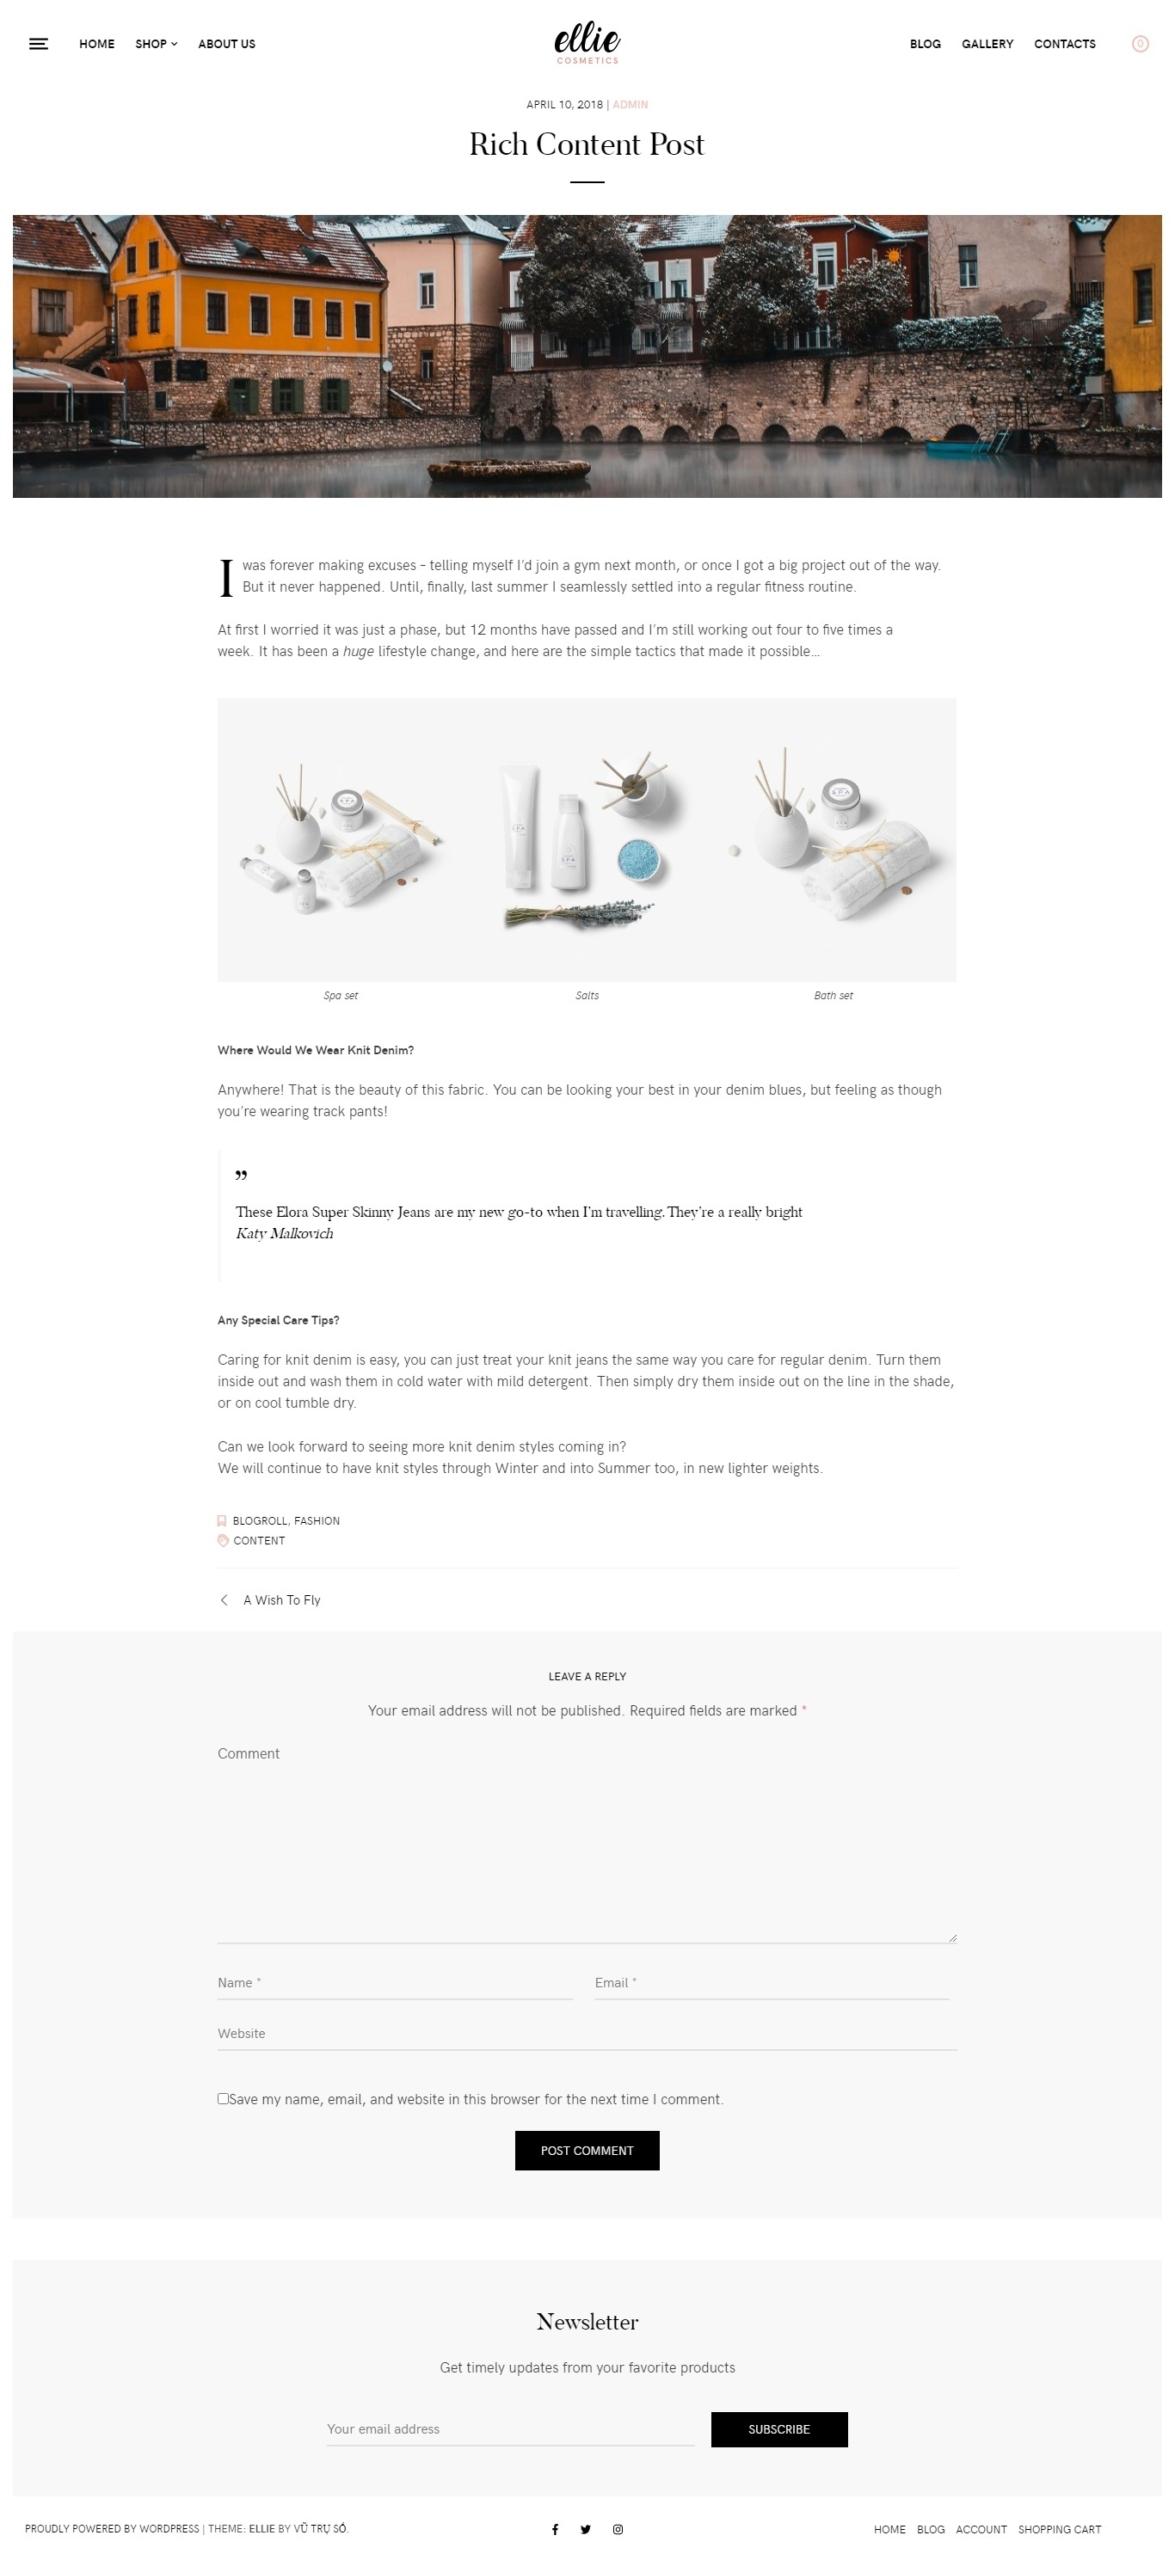 Mẫu website bán hàng online ELLIE